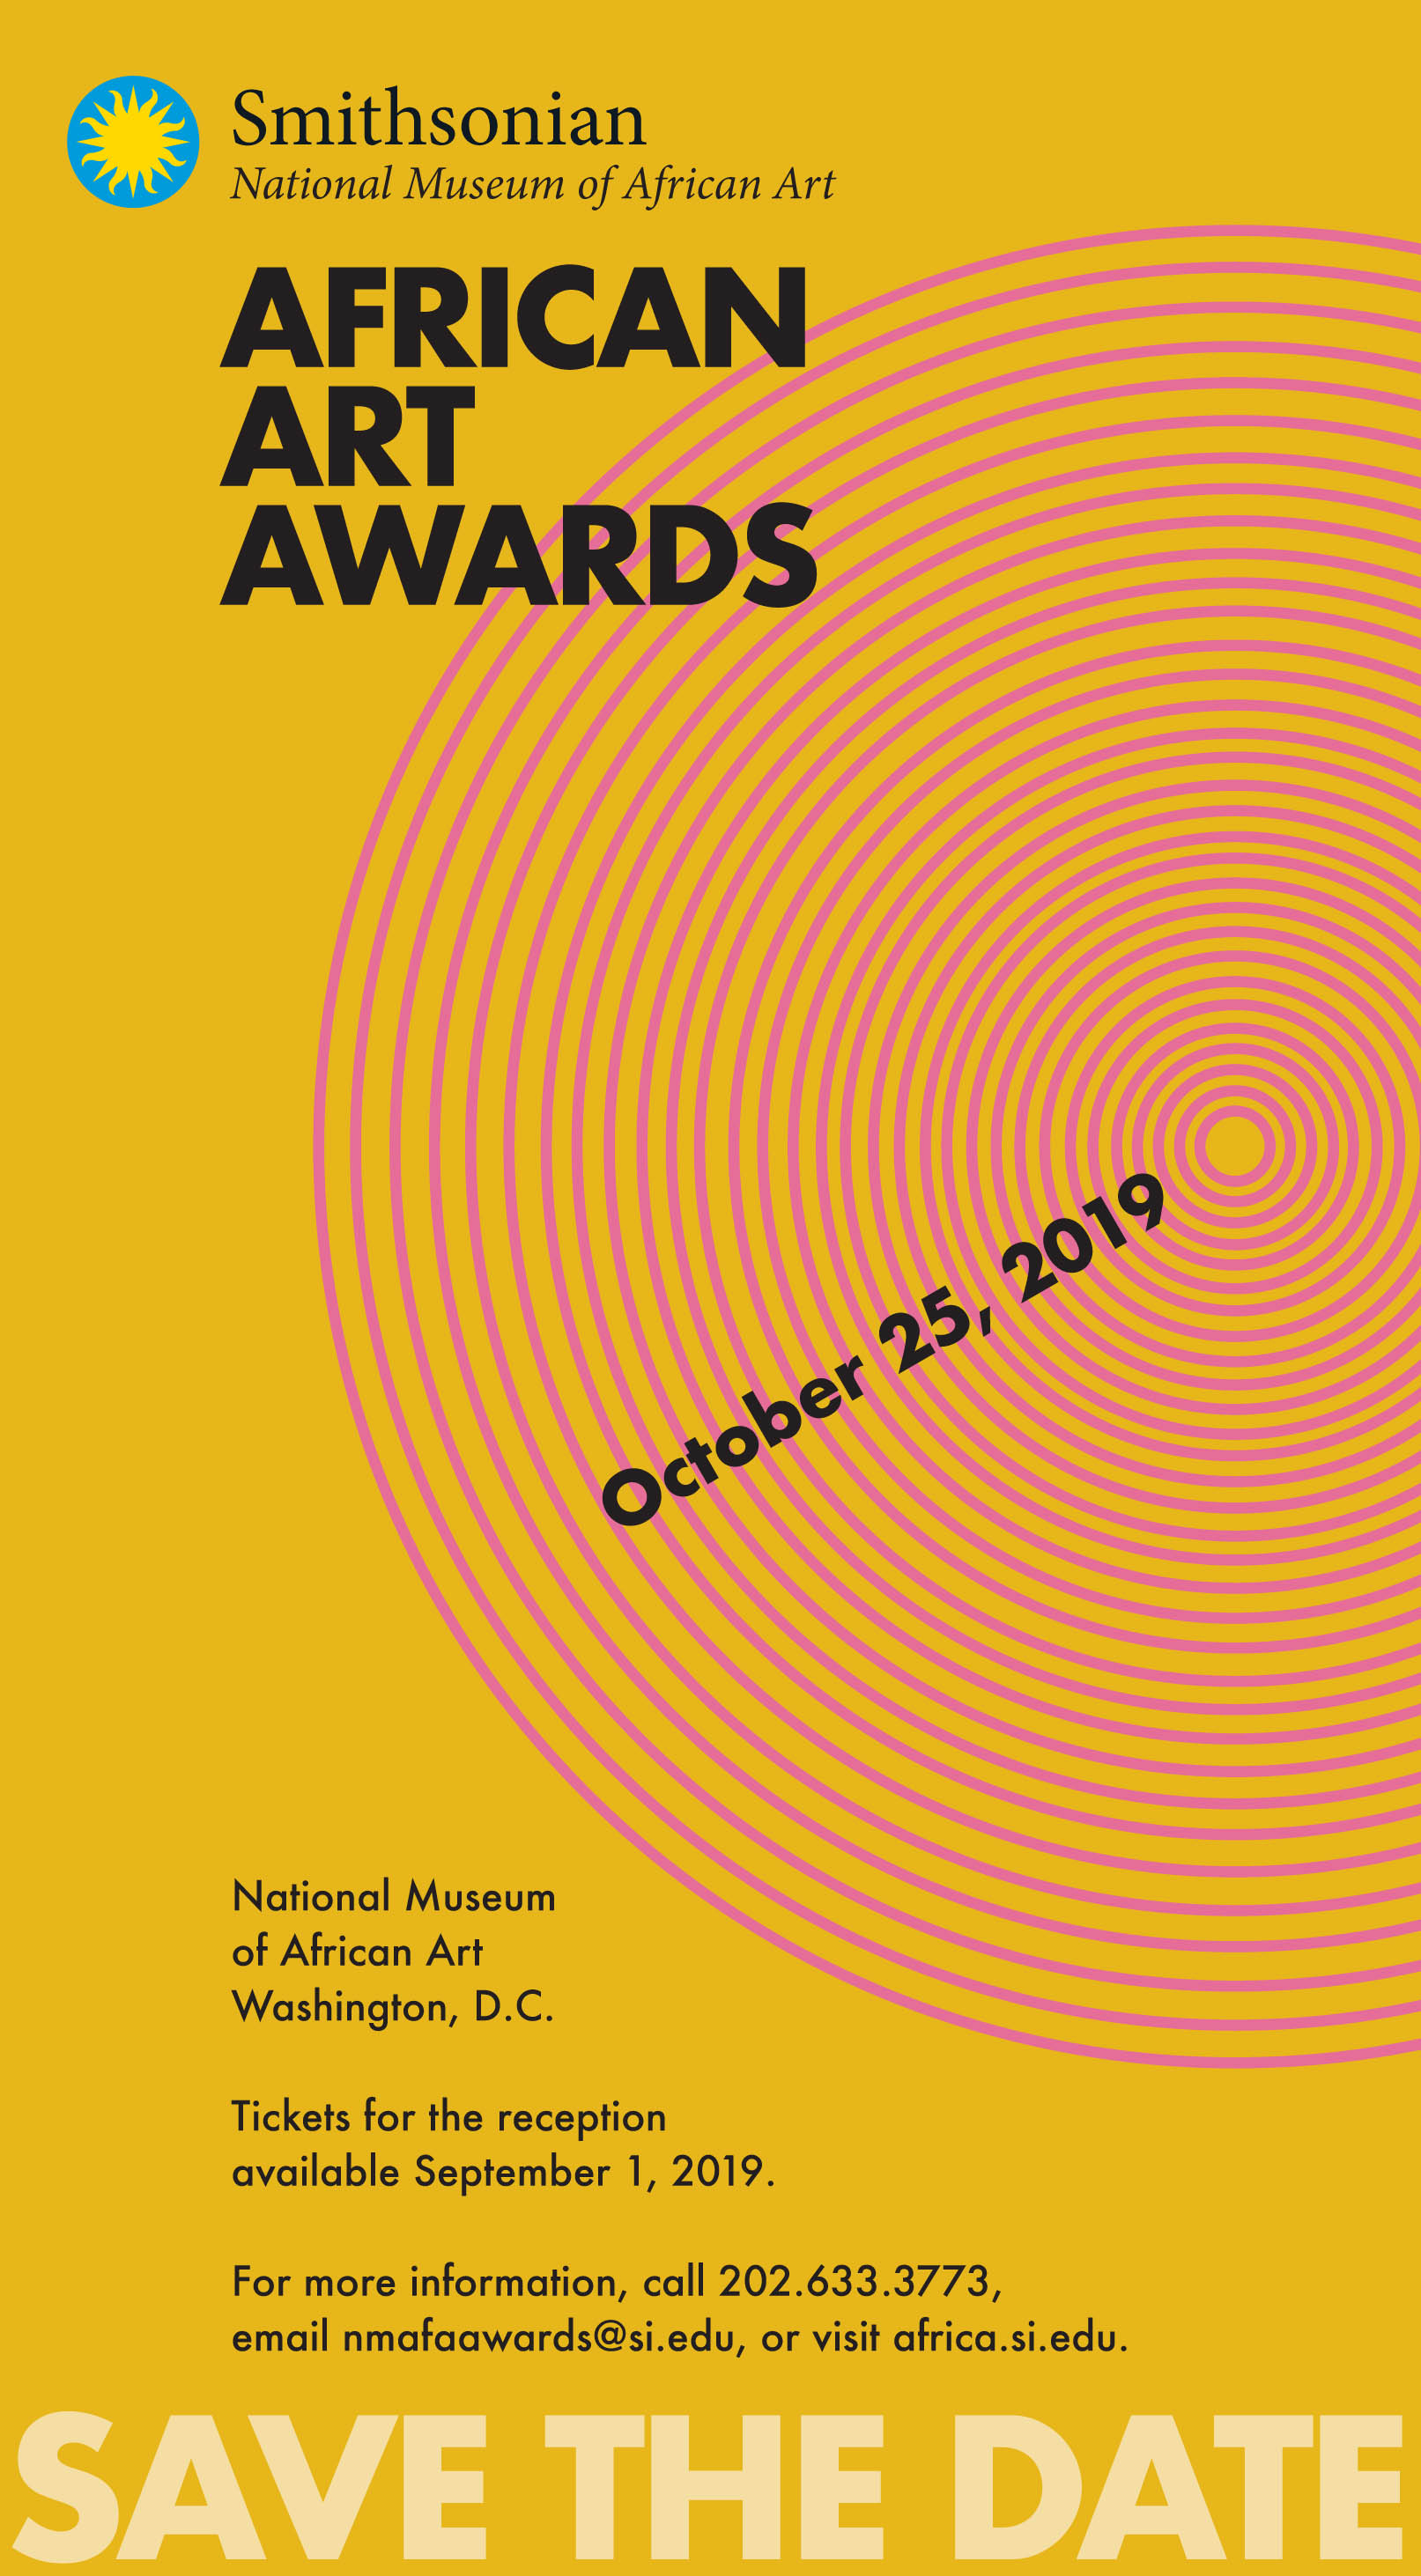 African Art Awards 2019